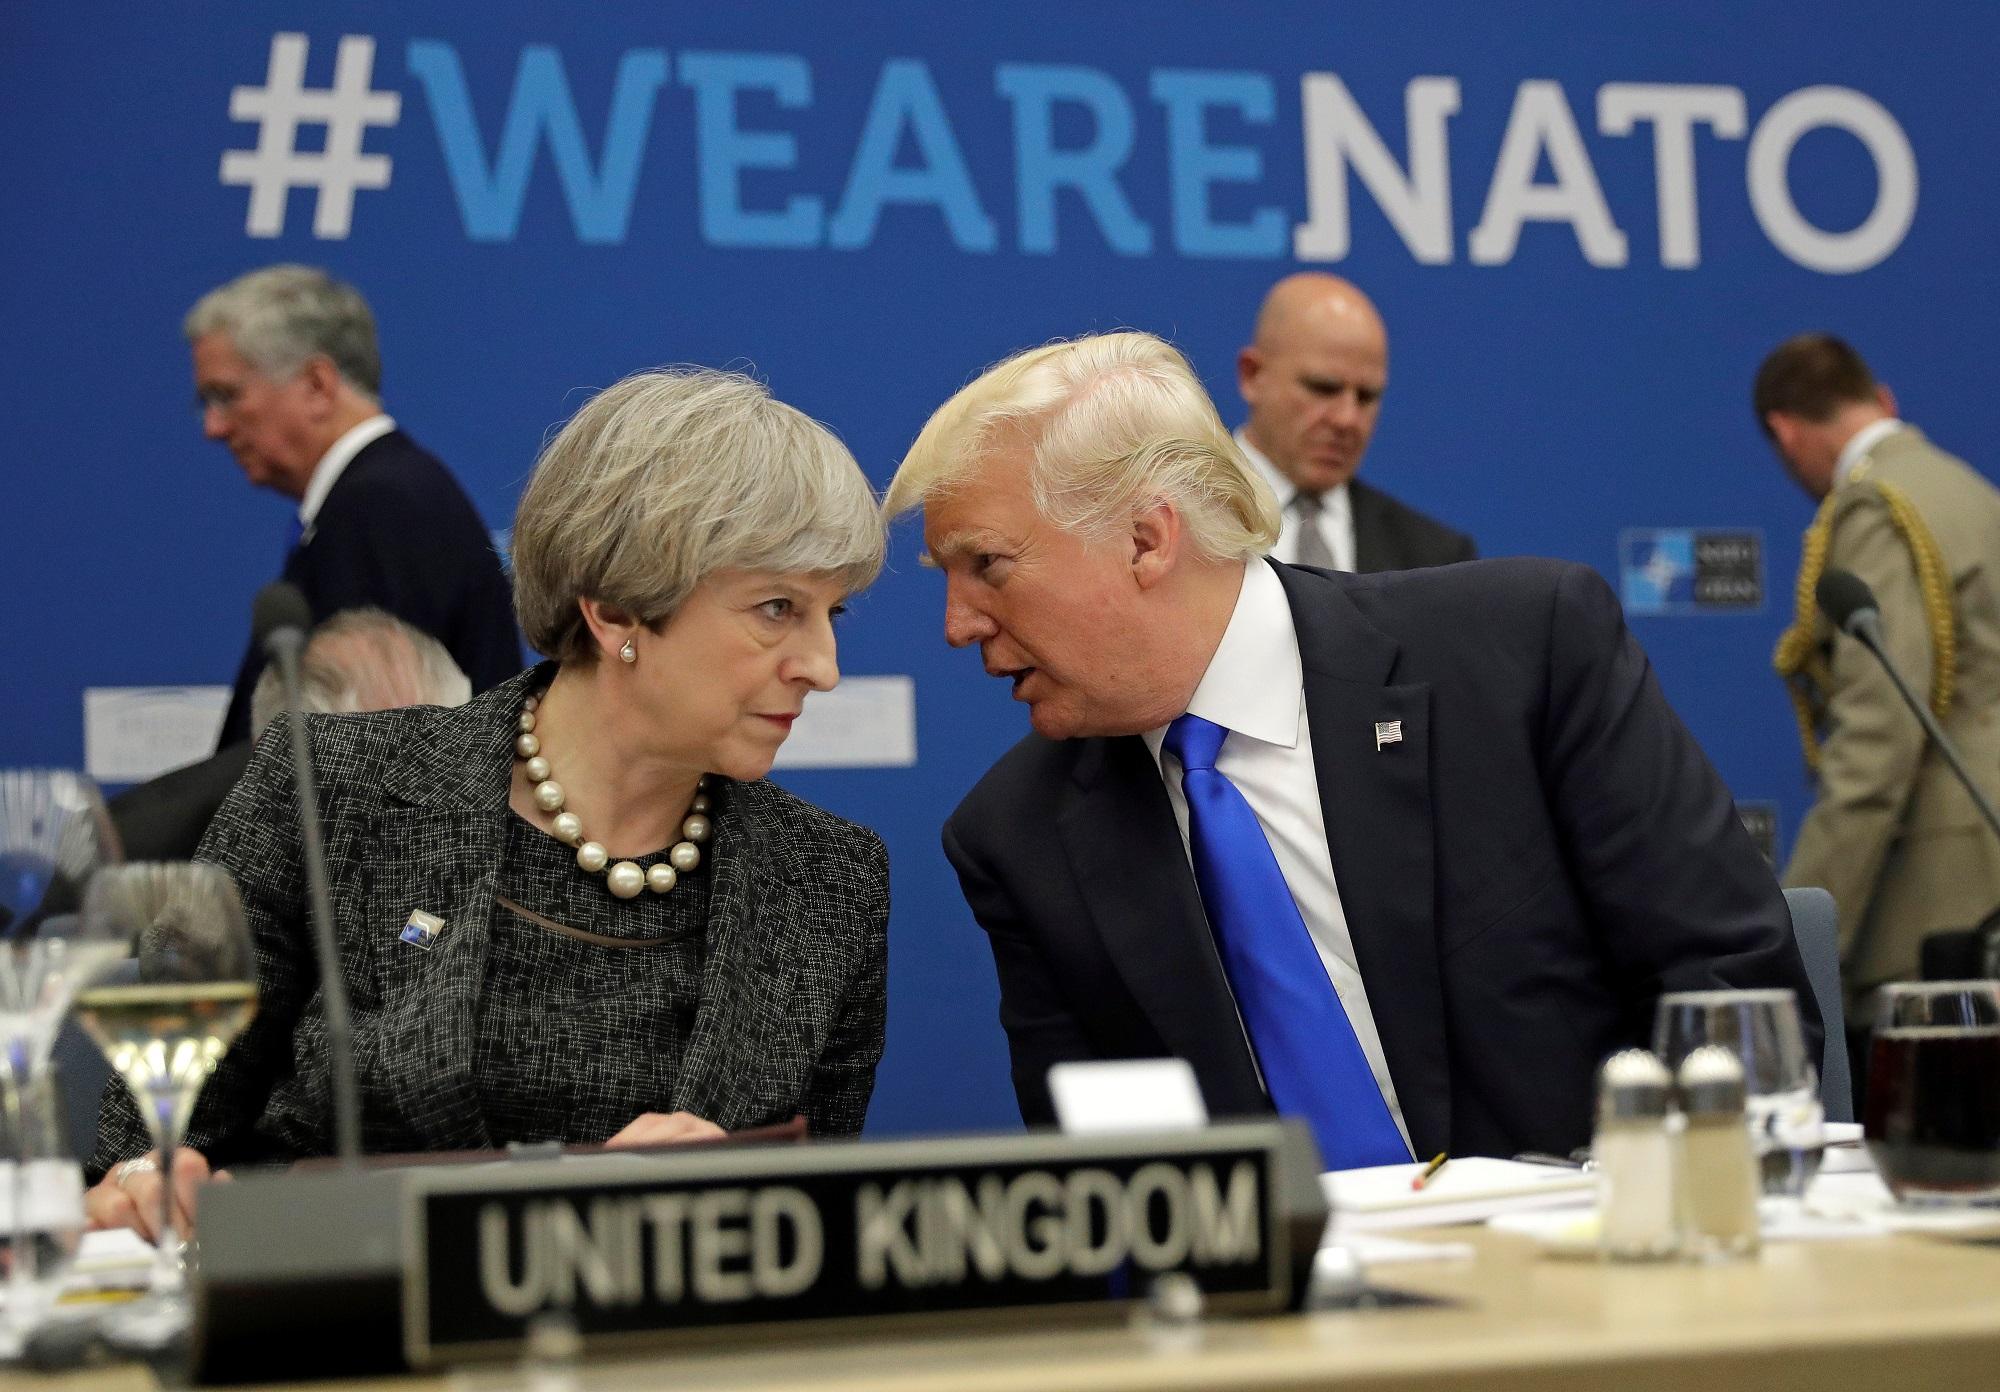 Trump NATO Reuters/Matt Dunham